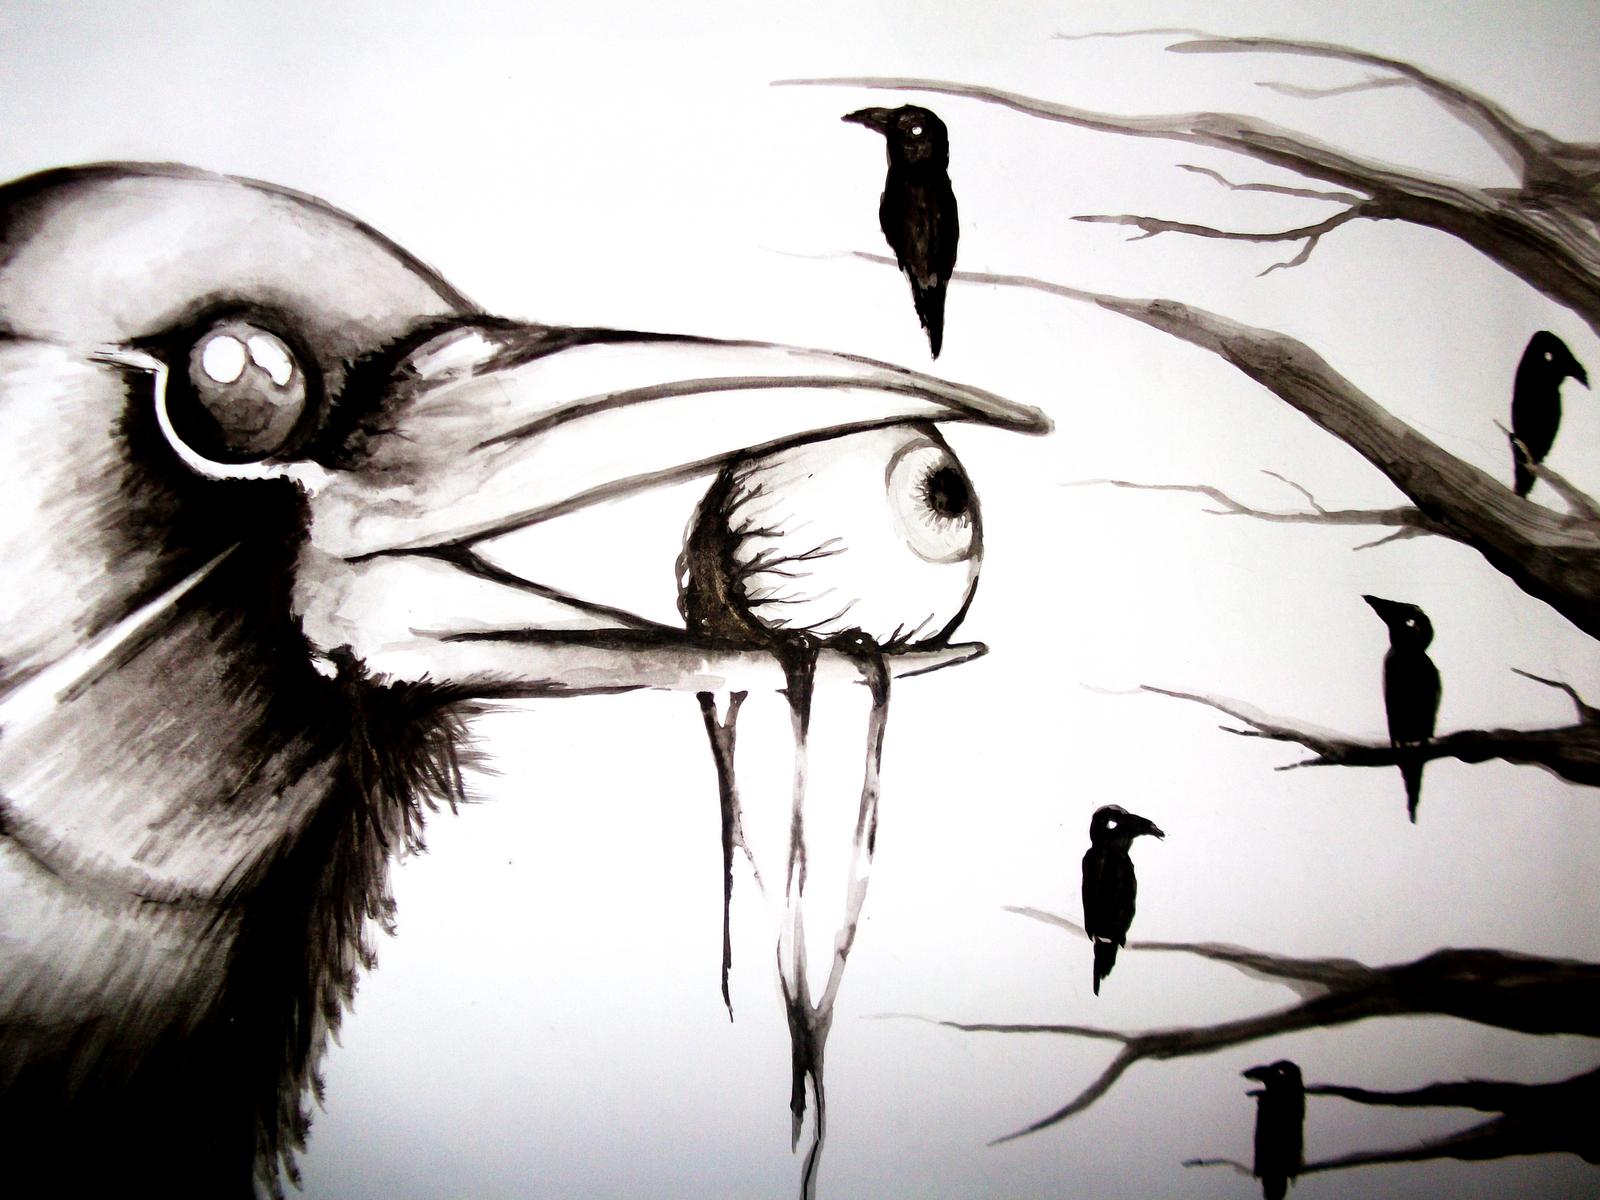 veo pixeles muertos cr a cuervos y te sacar n los ojos